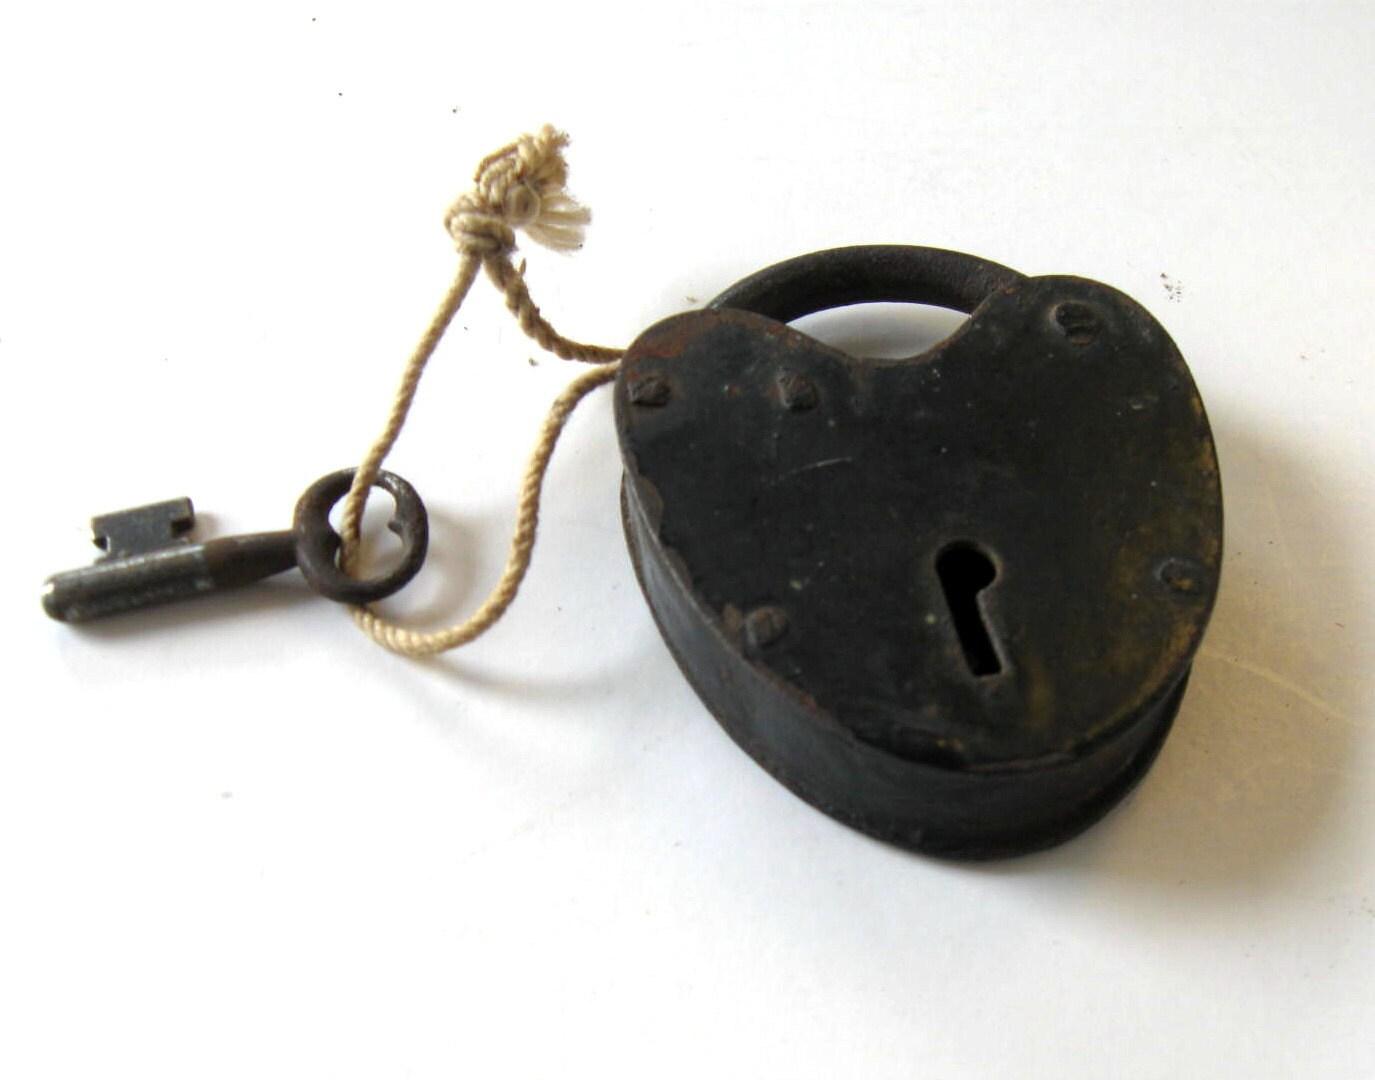 antique heart shaped lock and key small padlock wedding. Black Bedroom Furniture Sets. Home Design Ideas